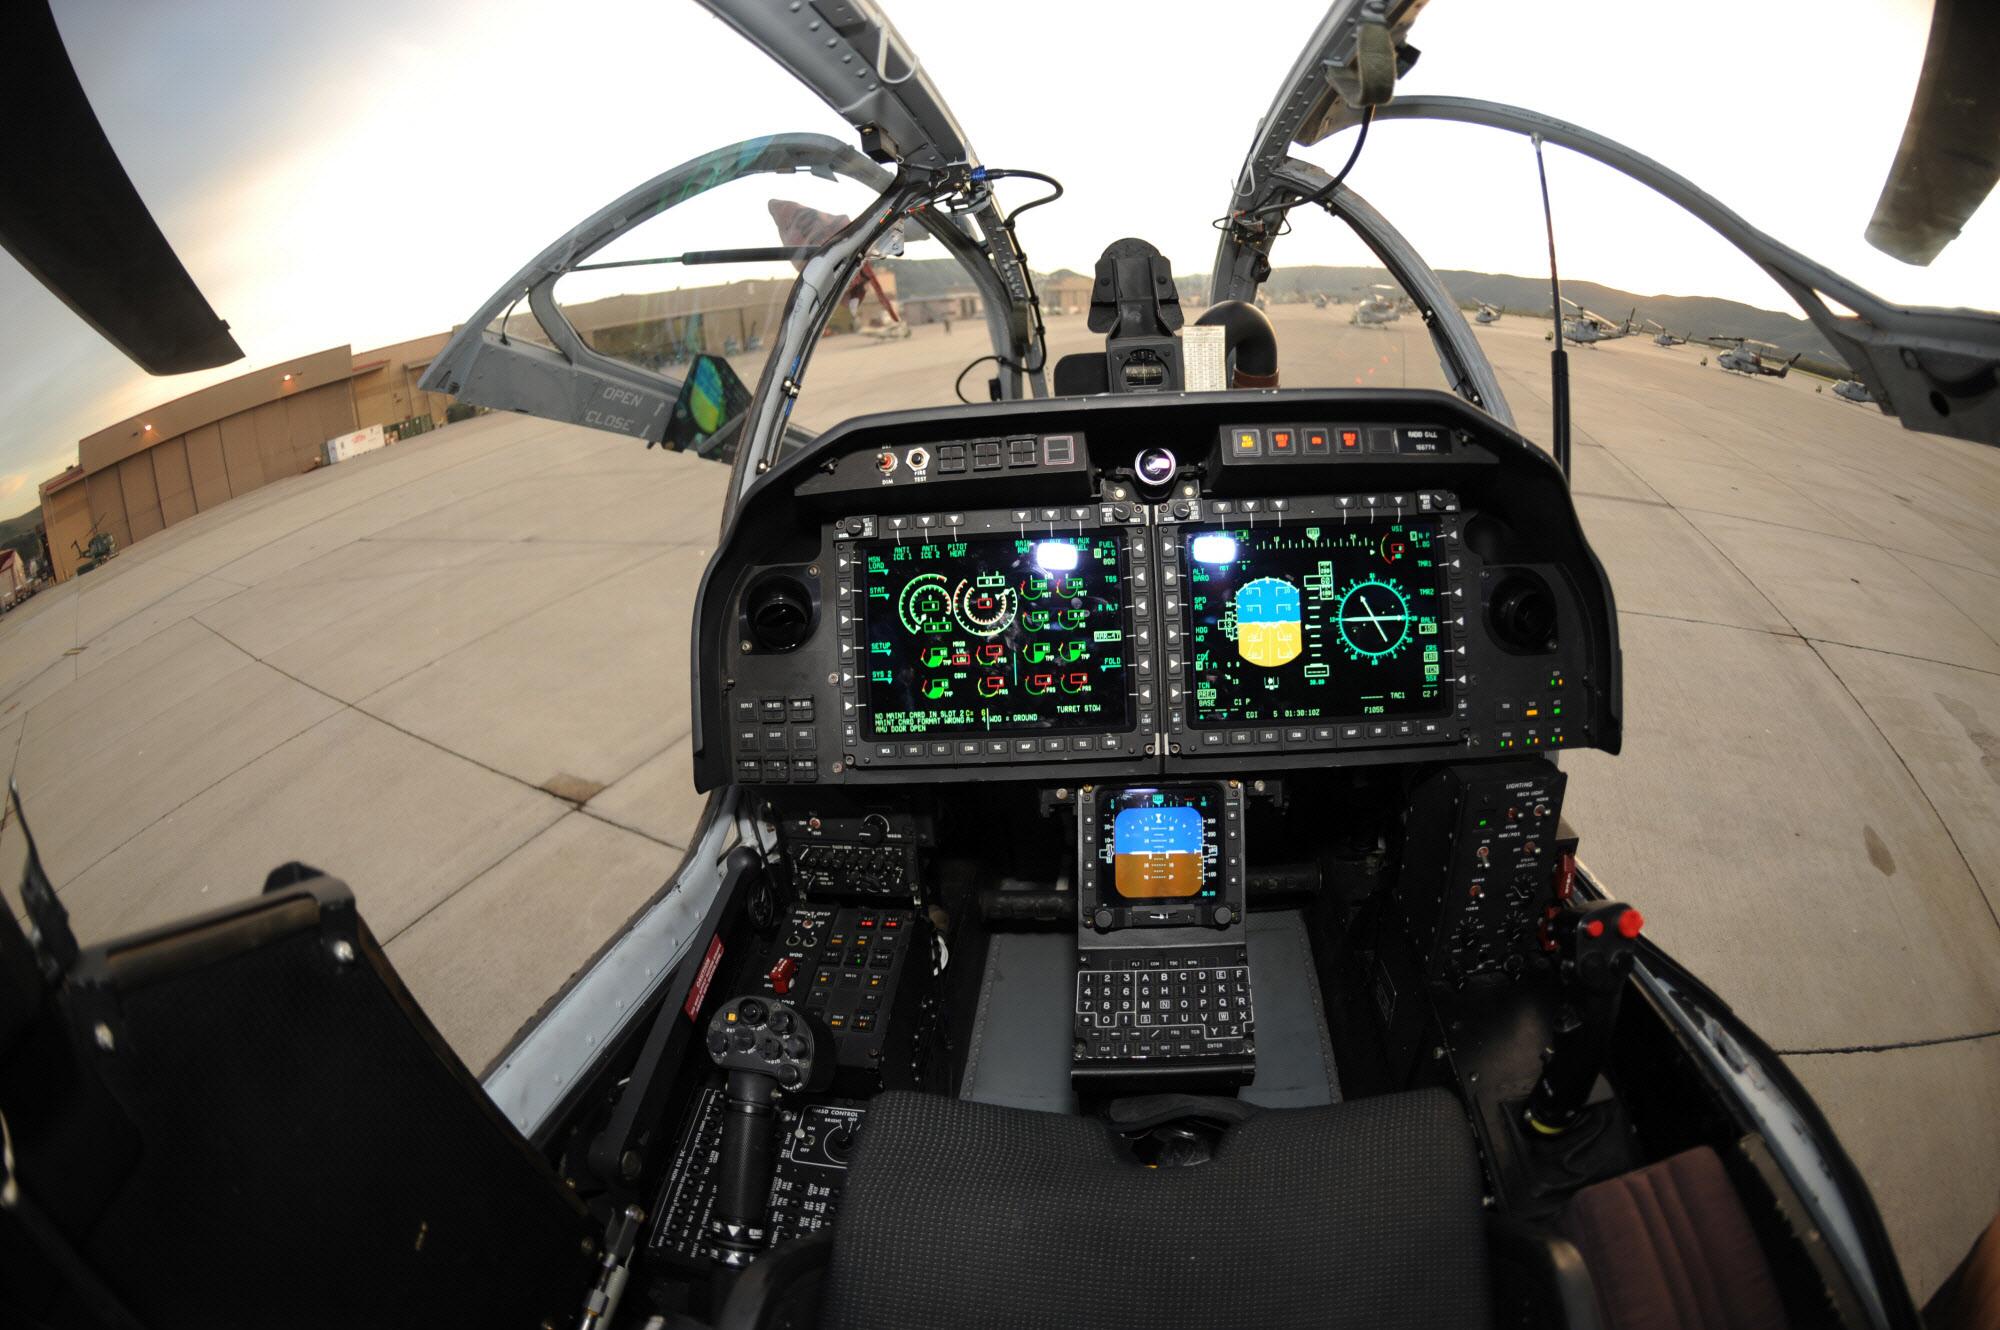 http://www.aereo.jor.br/wp-content/uploads/2010/10/AH-1Z-cockpit.jpg